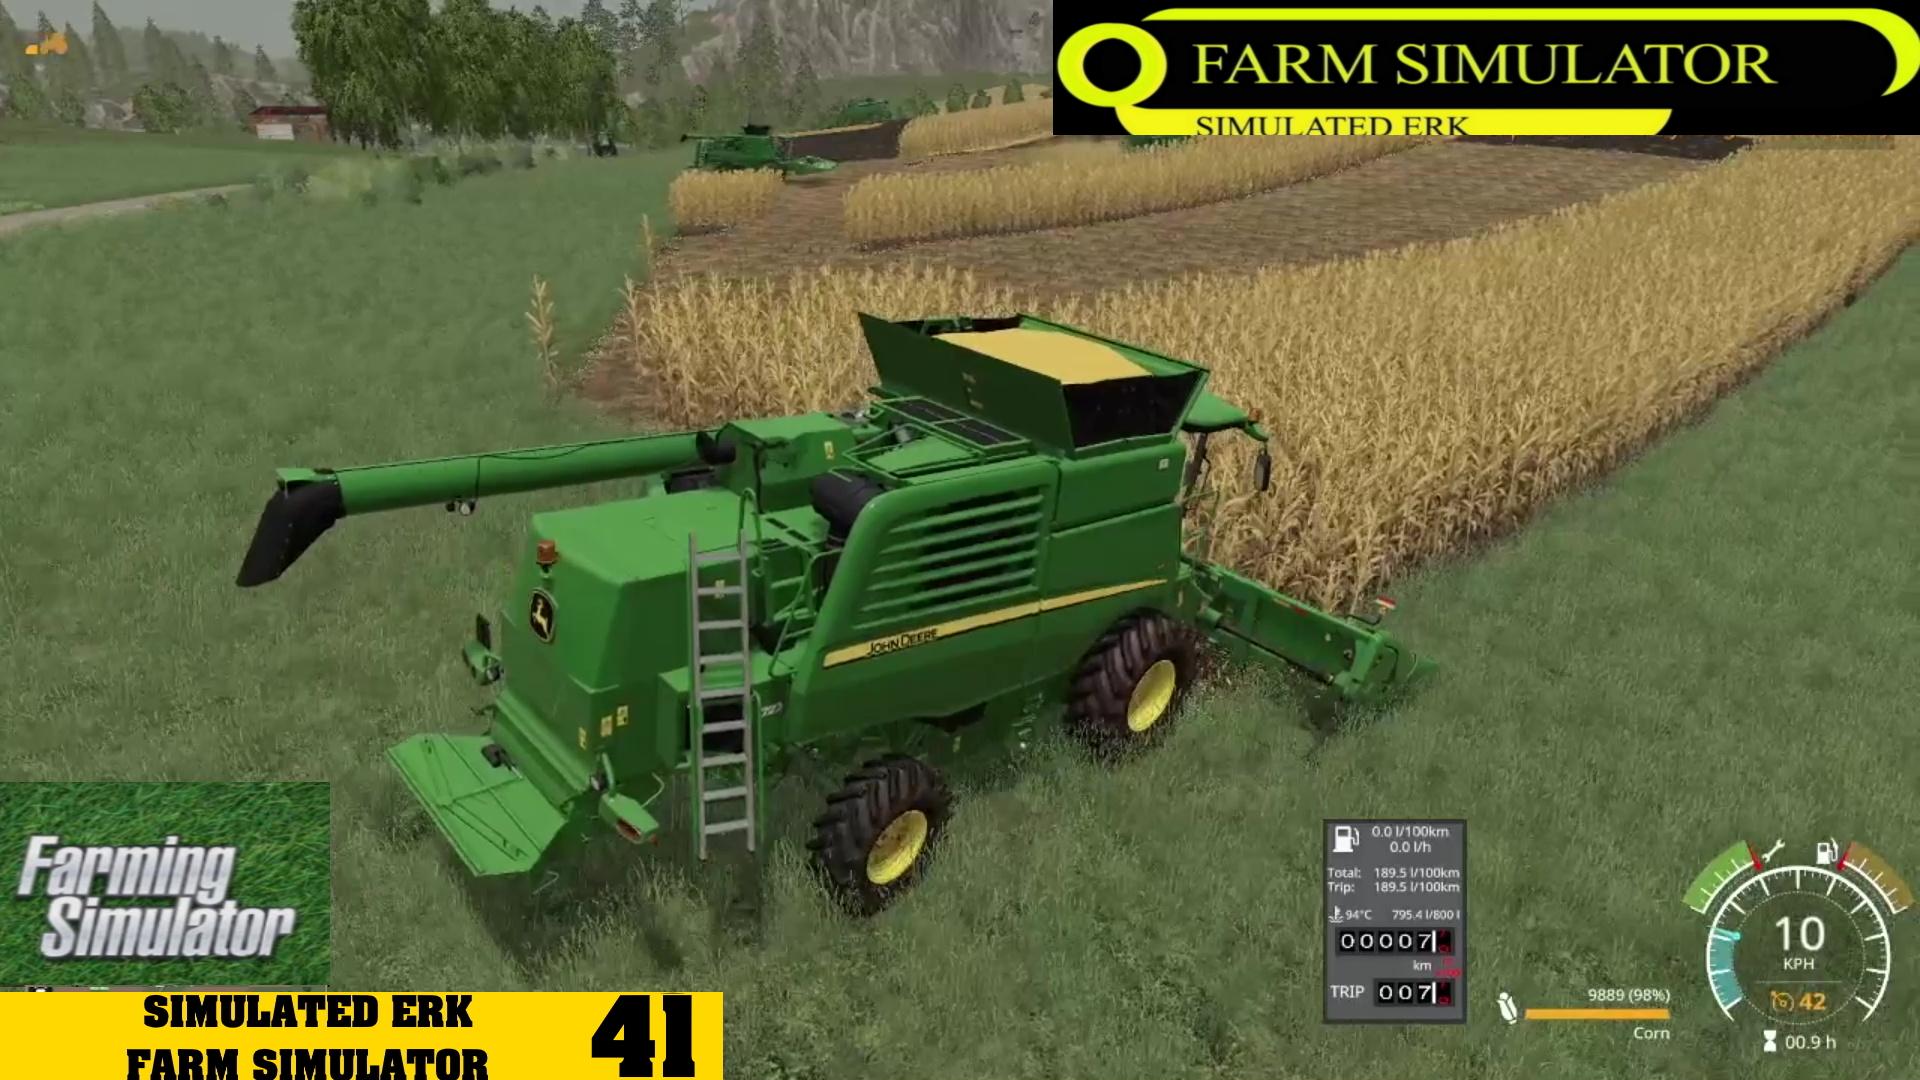 Simulated Erk: Farm Simulator episode 41   Getting The Harvest On